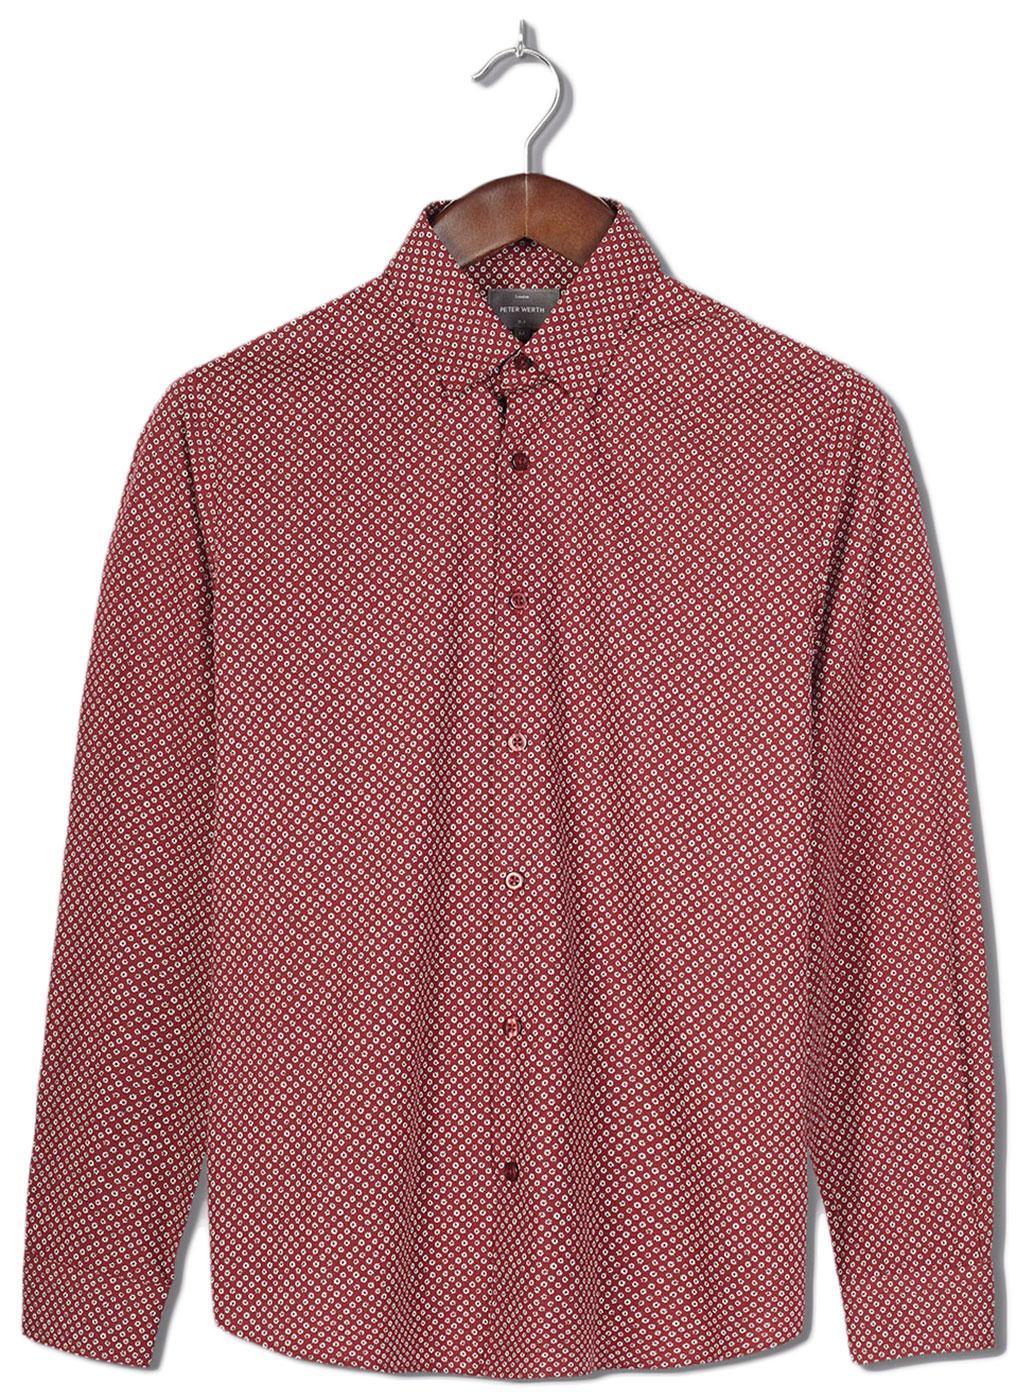 Ruttmann PETER WERTH 60s Mod Micro Floral Shirt B